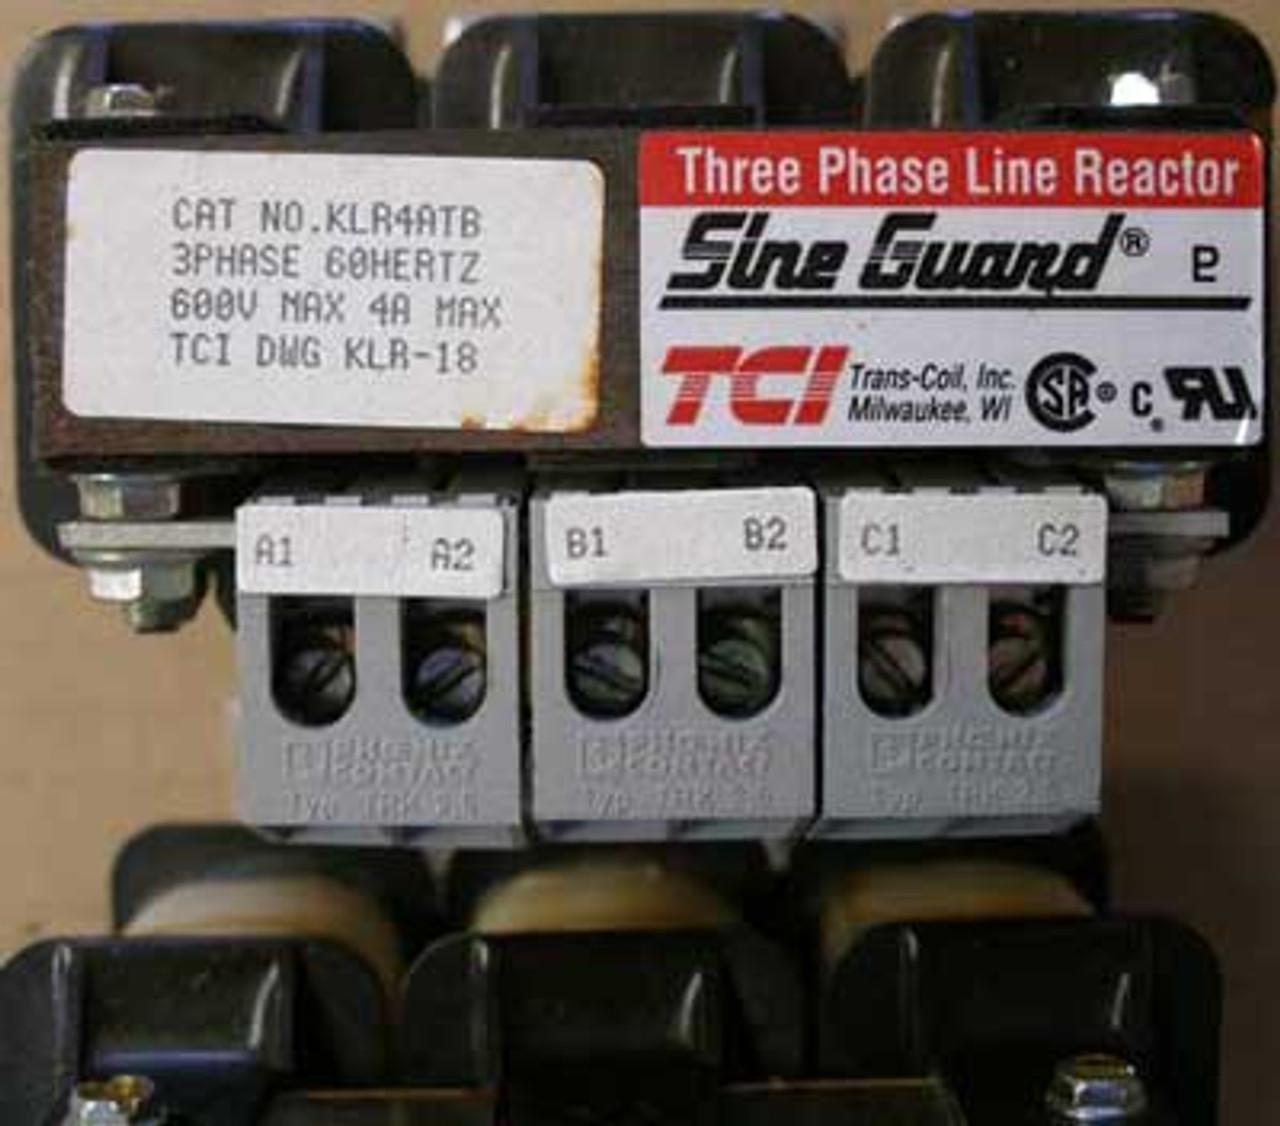 TCI Sine Guard KLR4ATB 3 Phase LIne Reactor 600V 4 Amp - Used